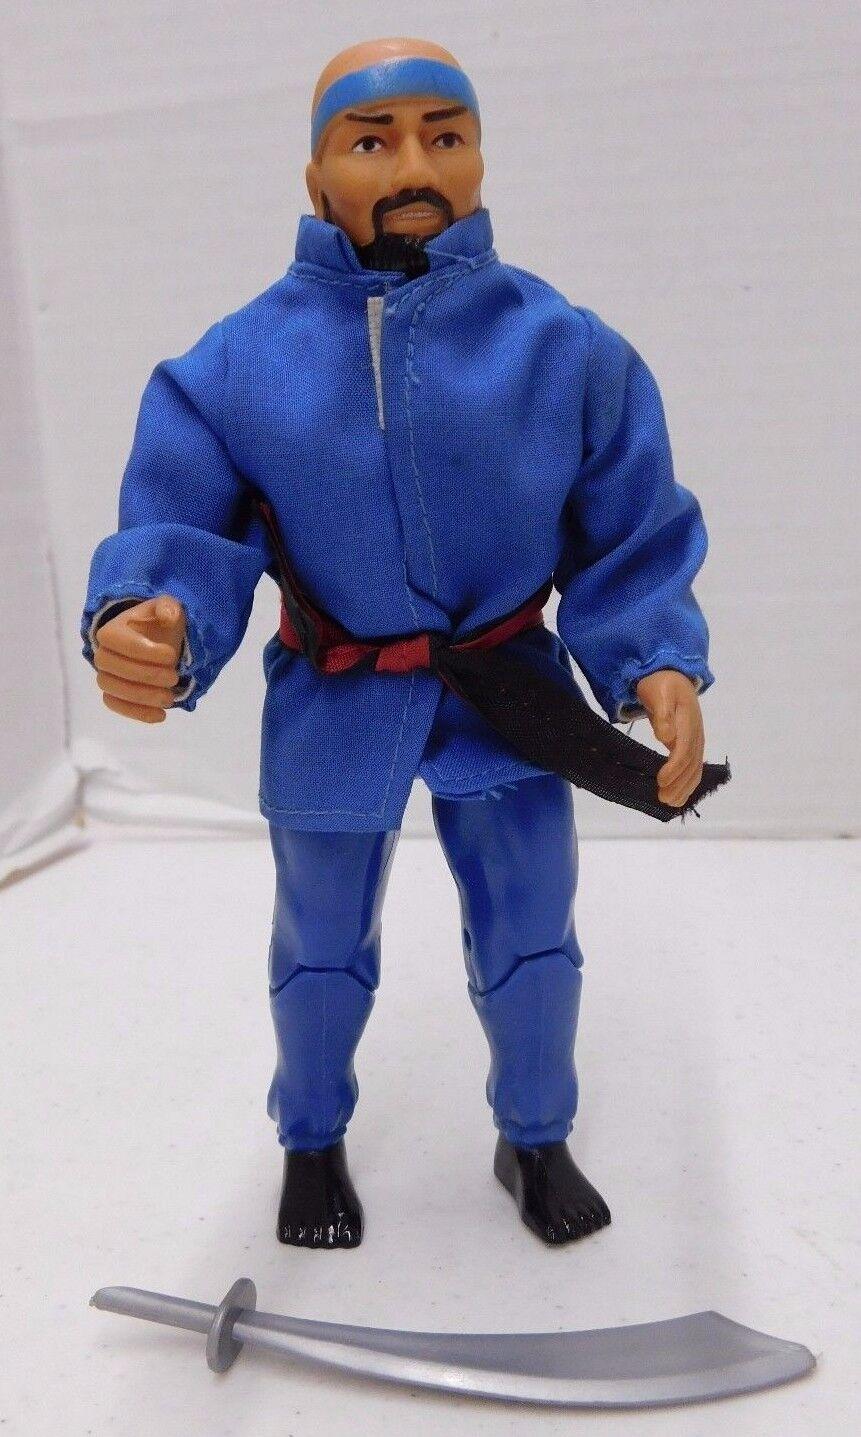 Lanard drachen force Blau kung - fu - meister dragonmaster - vintage - action - figur